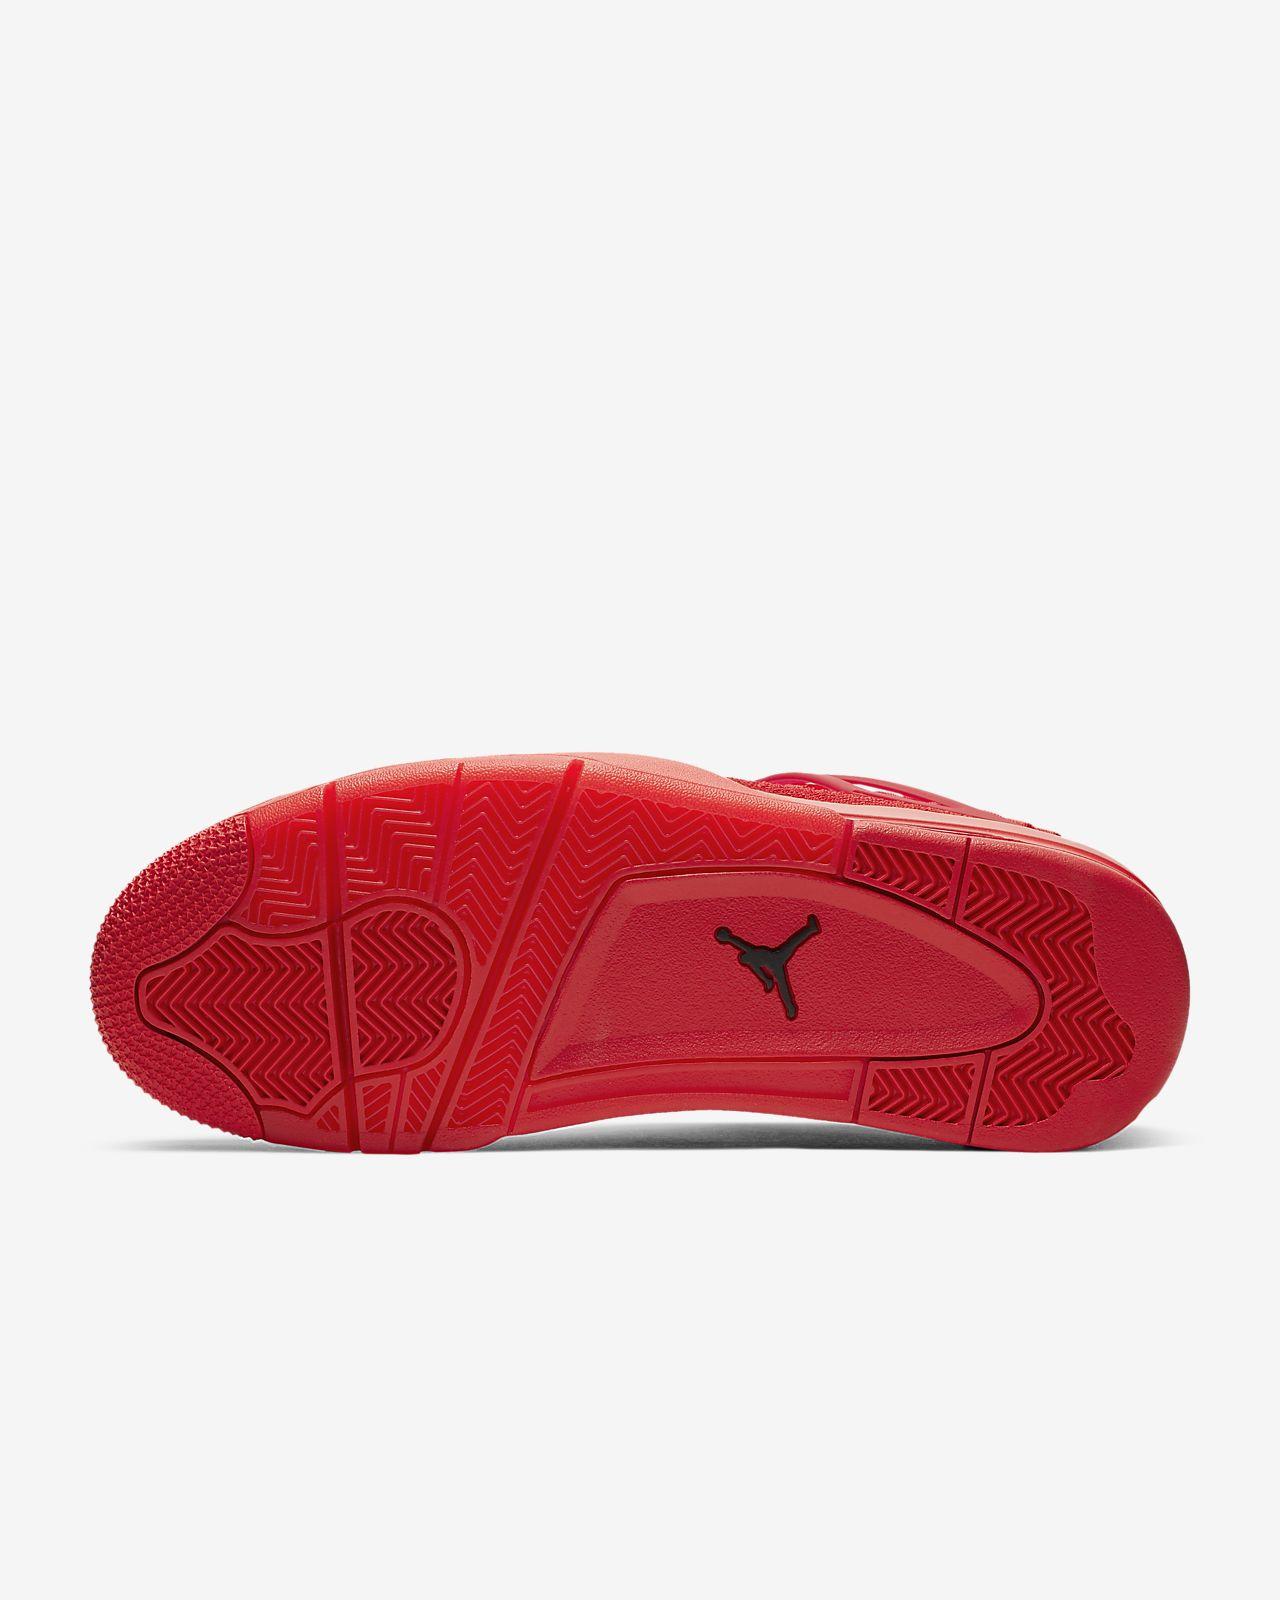 f354c31f499 Air Jordan 4 Retro Flyknit Men's Shoe. Nike.com